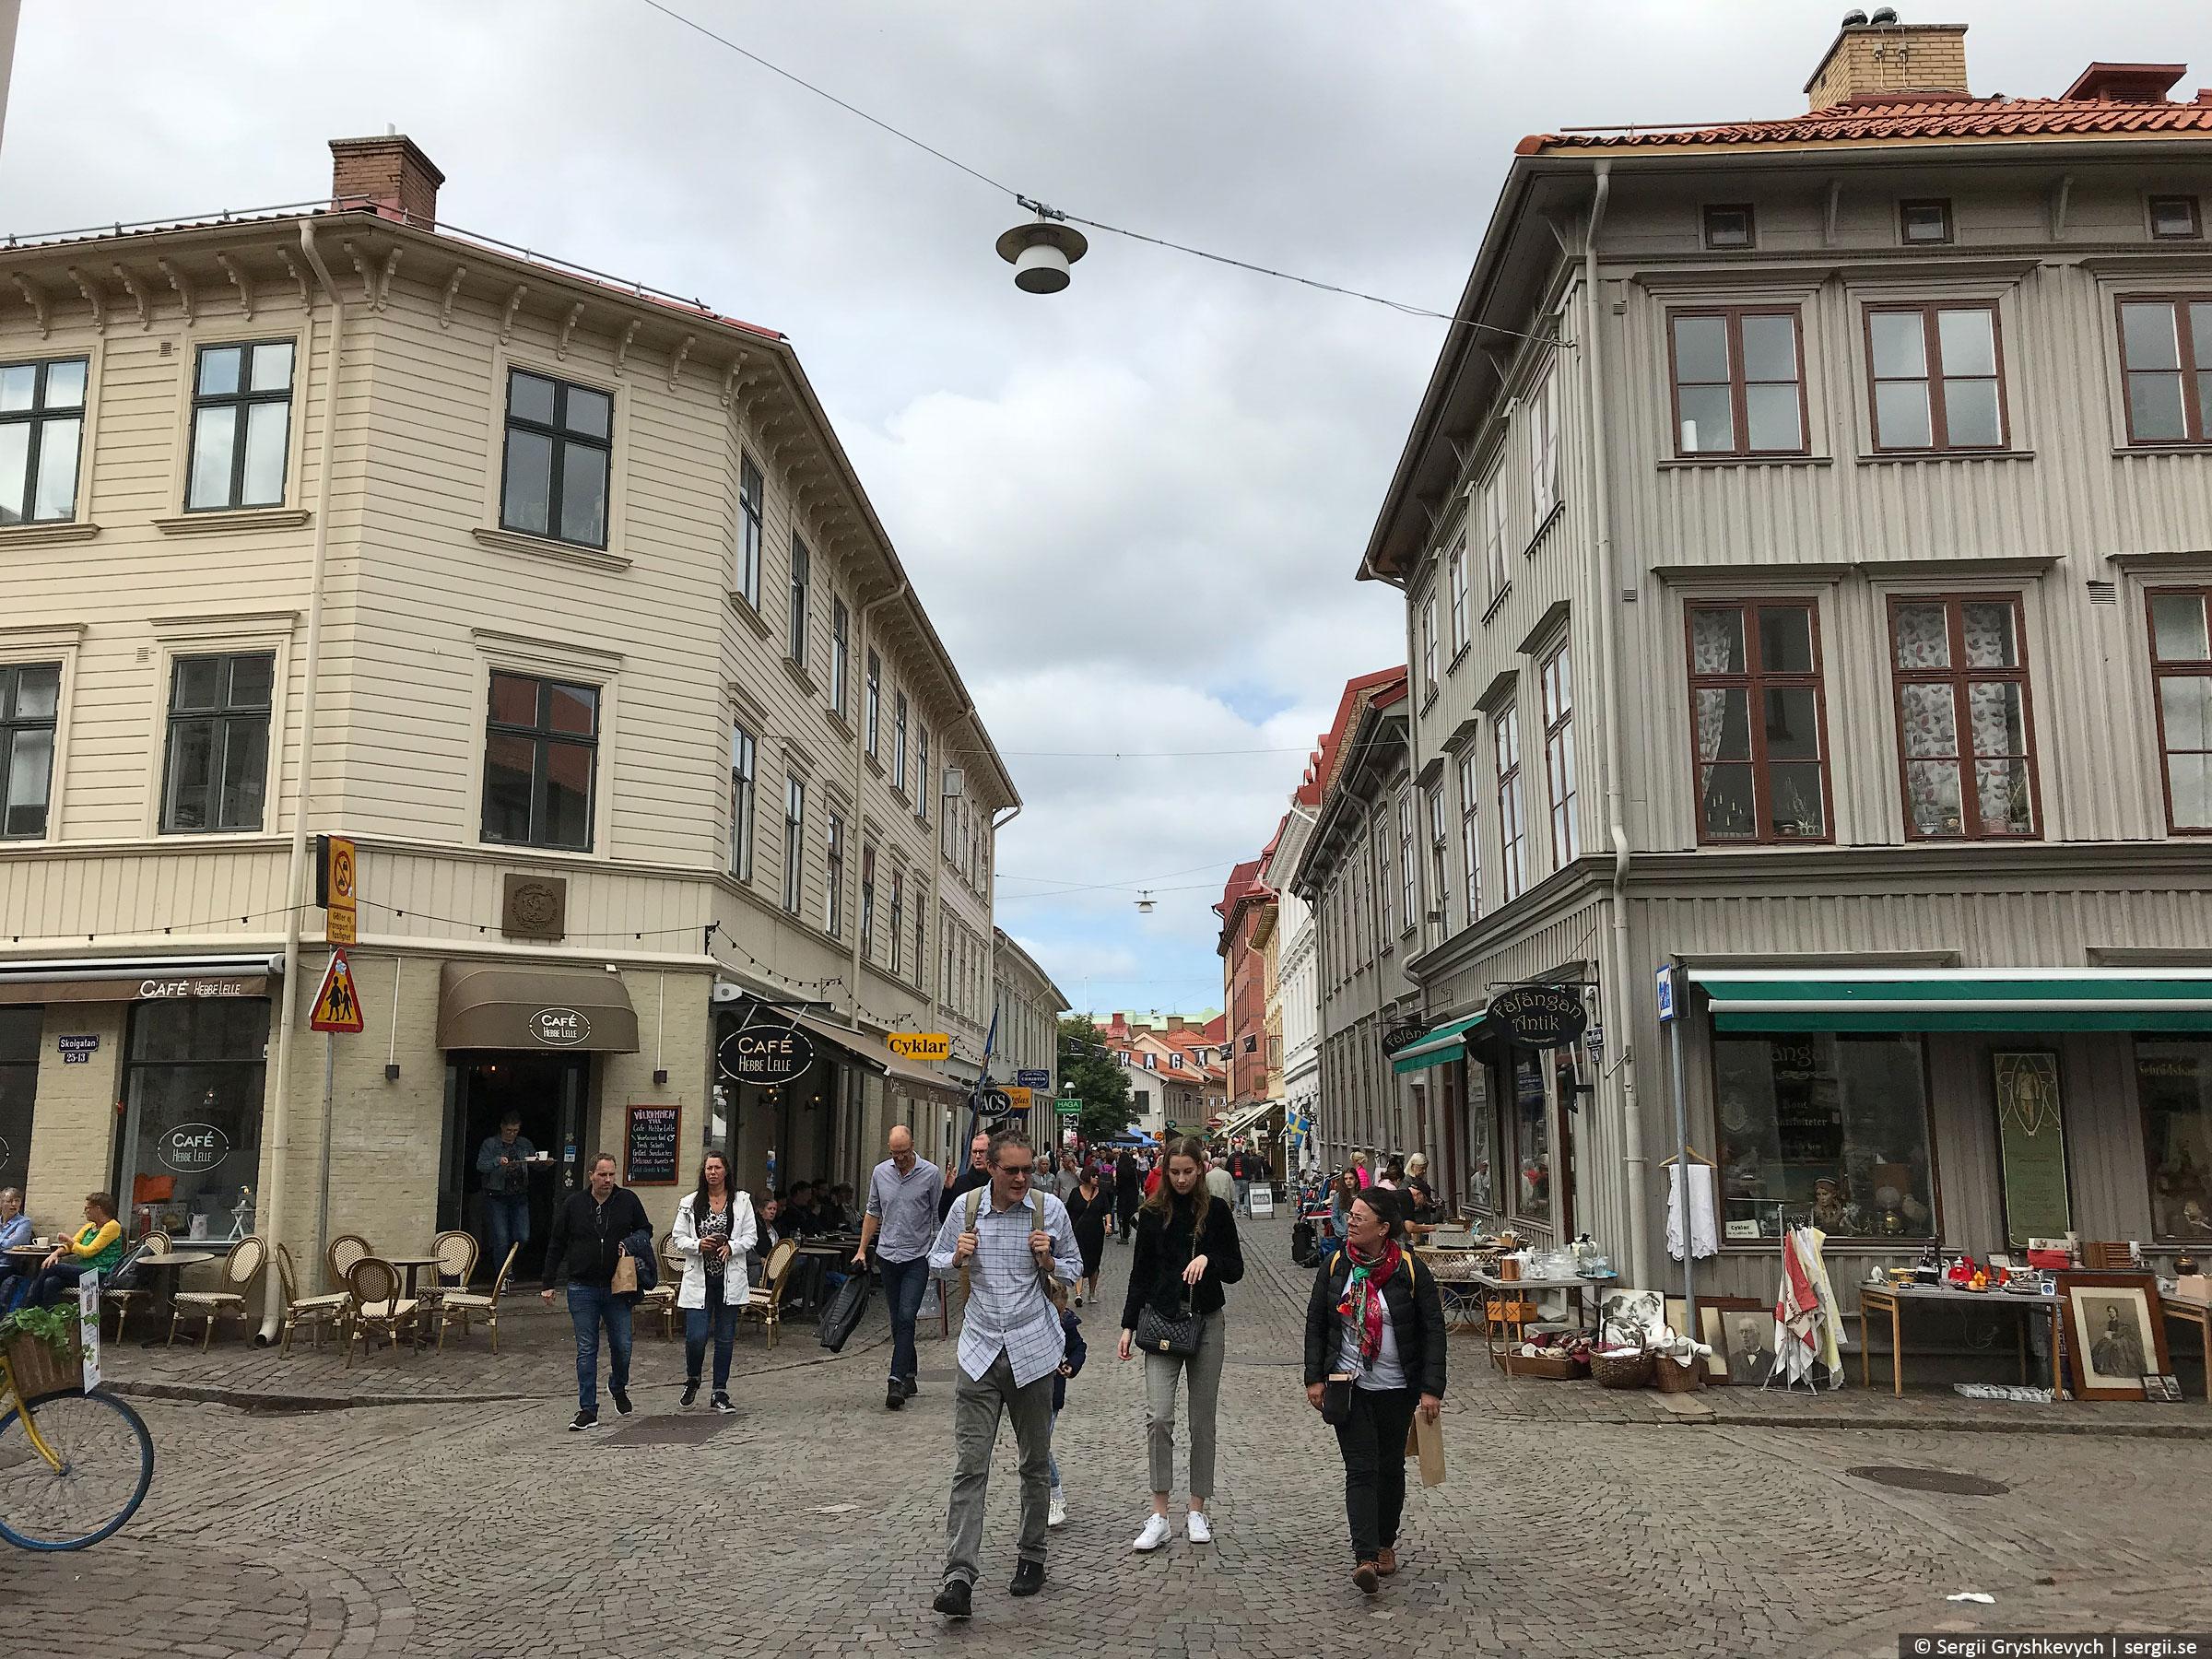 göteborg-ghotenburg-sweden-2018-41